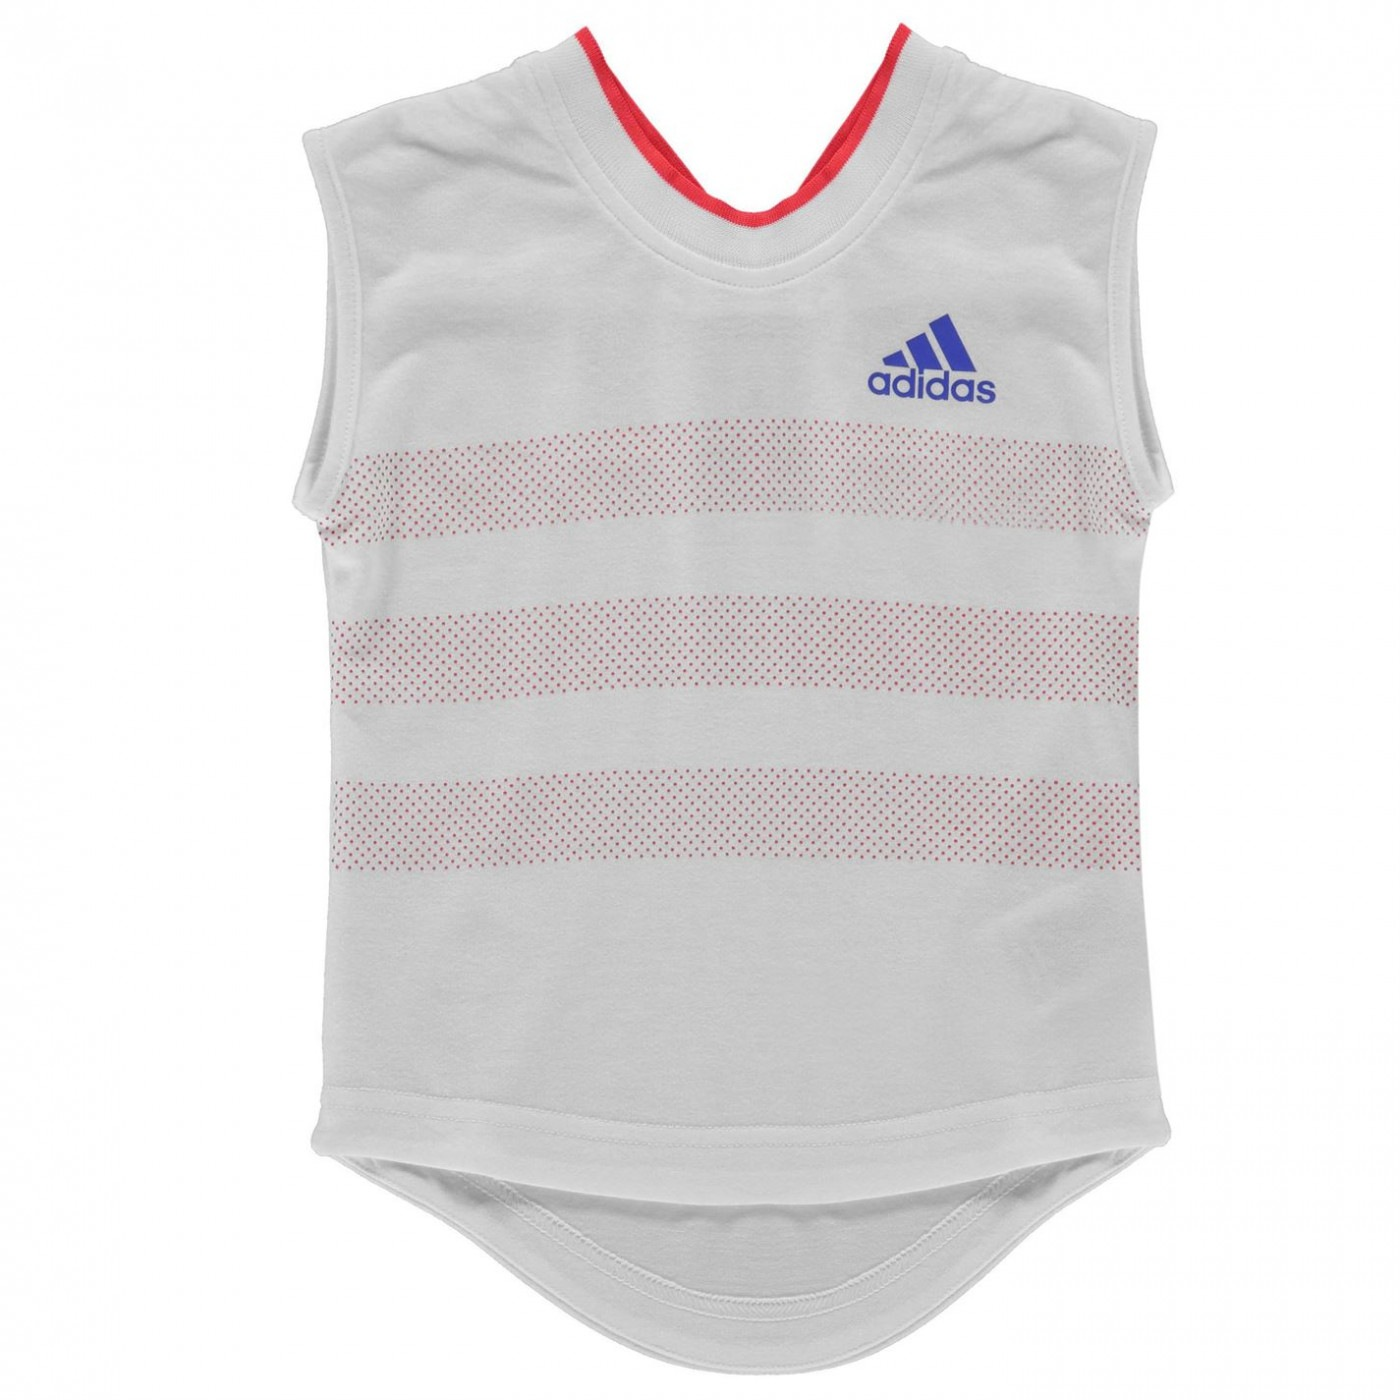 Adidas Summer Sleeveless Top Child Girls